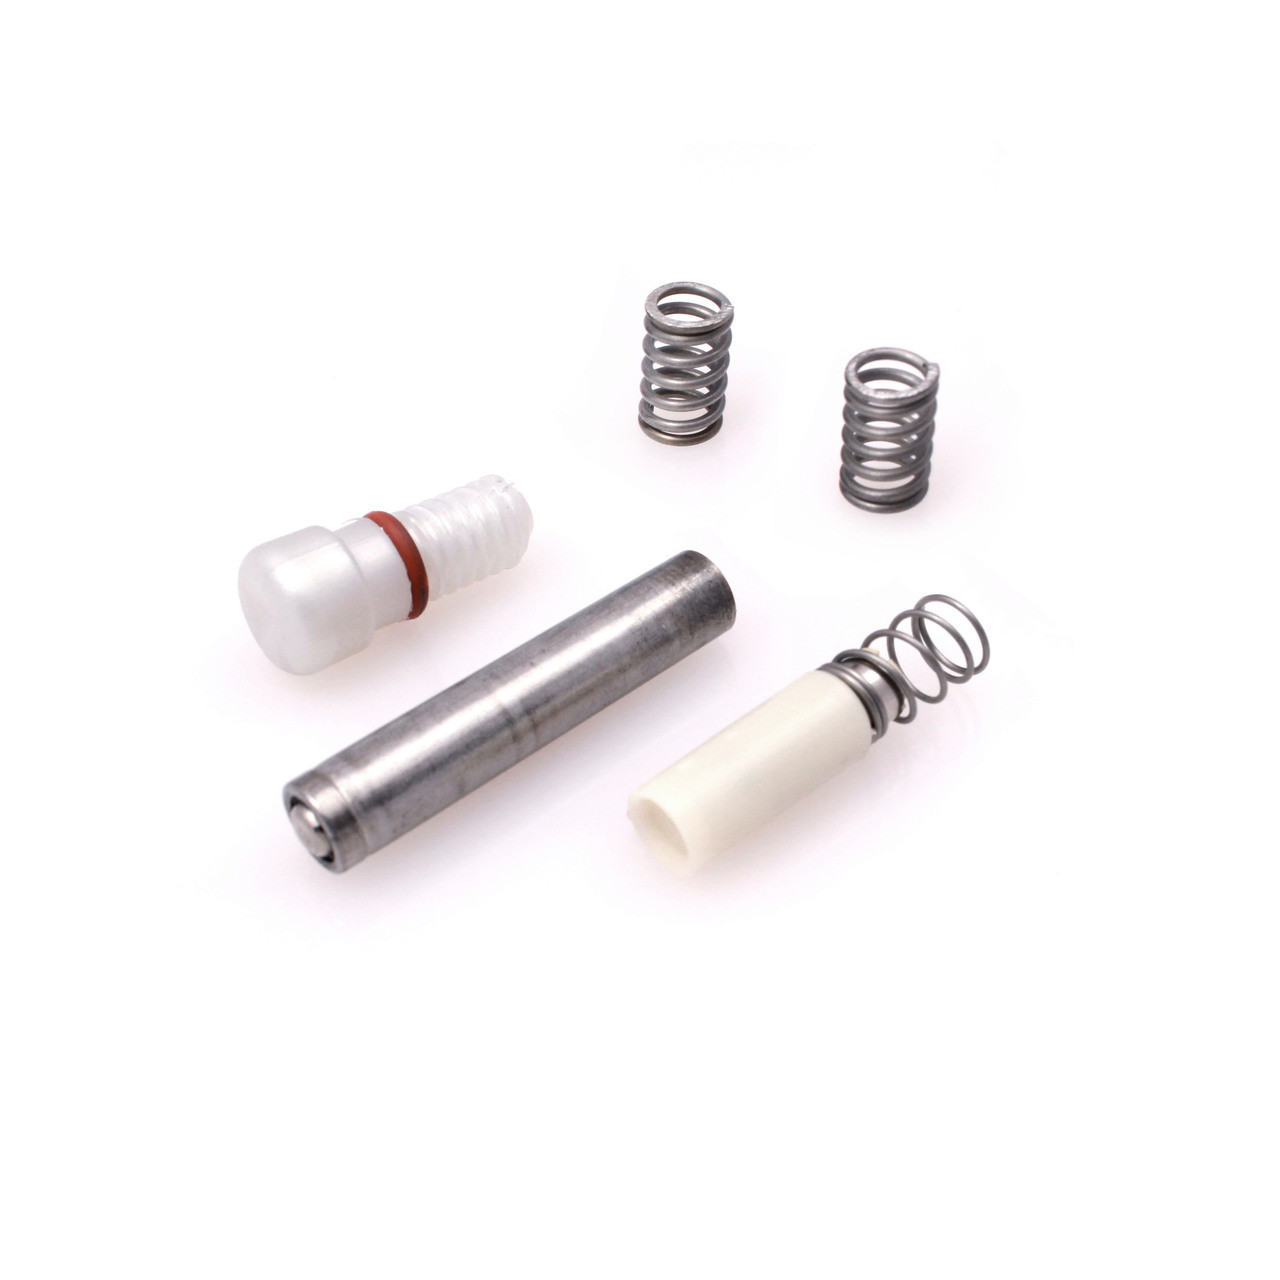 Spare Parts Kit for the Z-Vibe or Z-Grabber